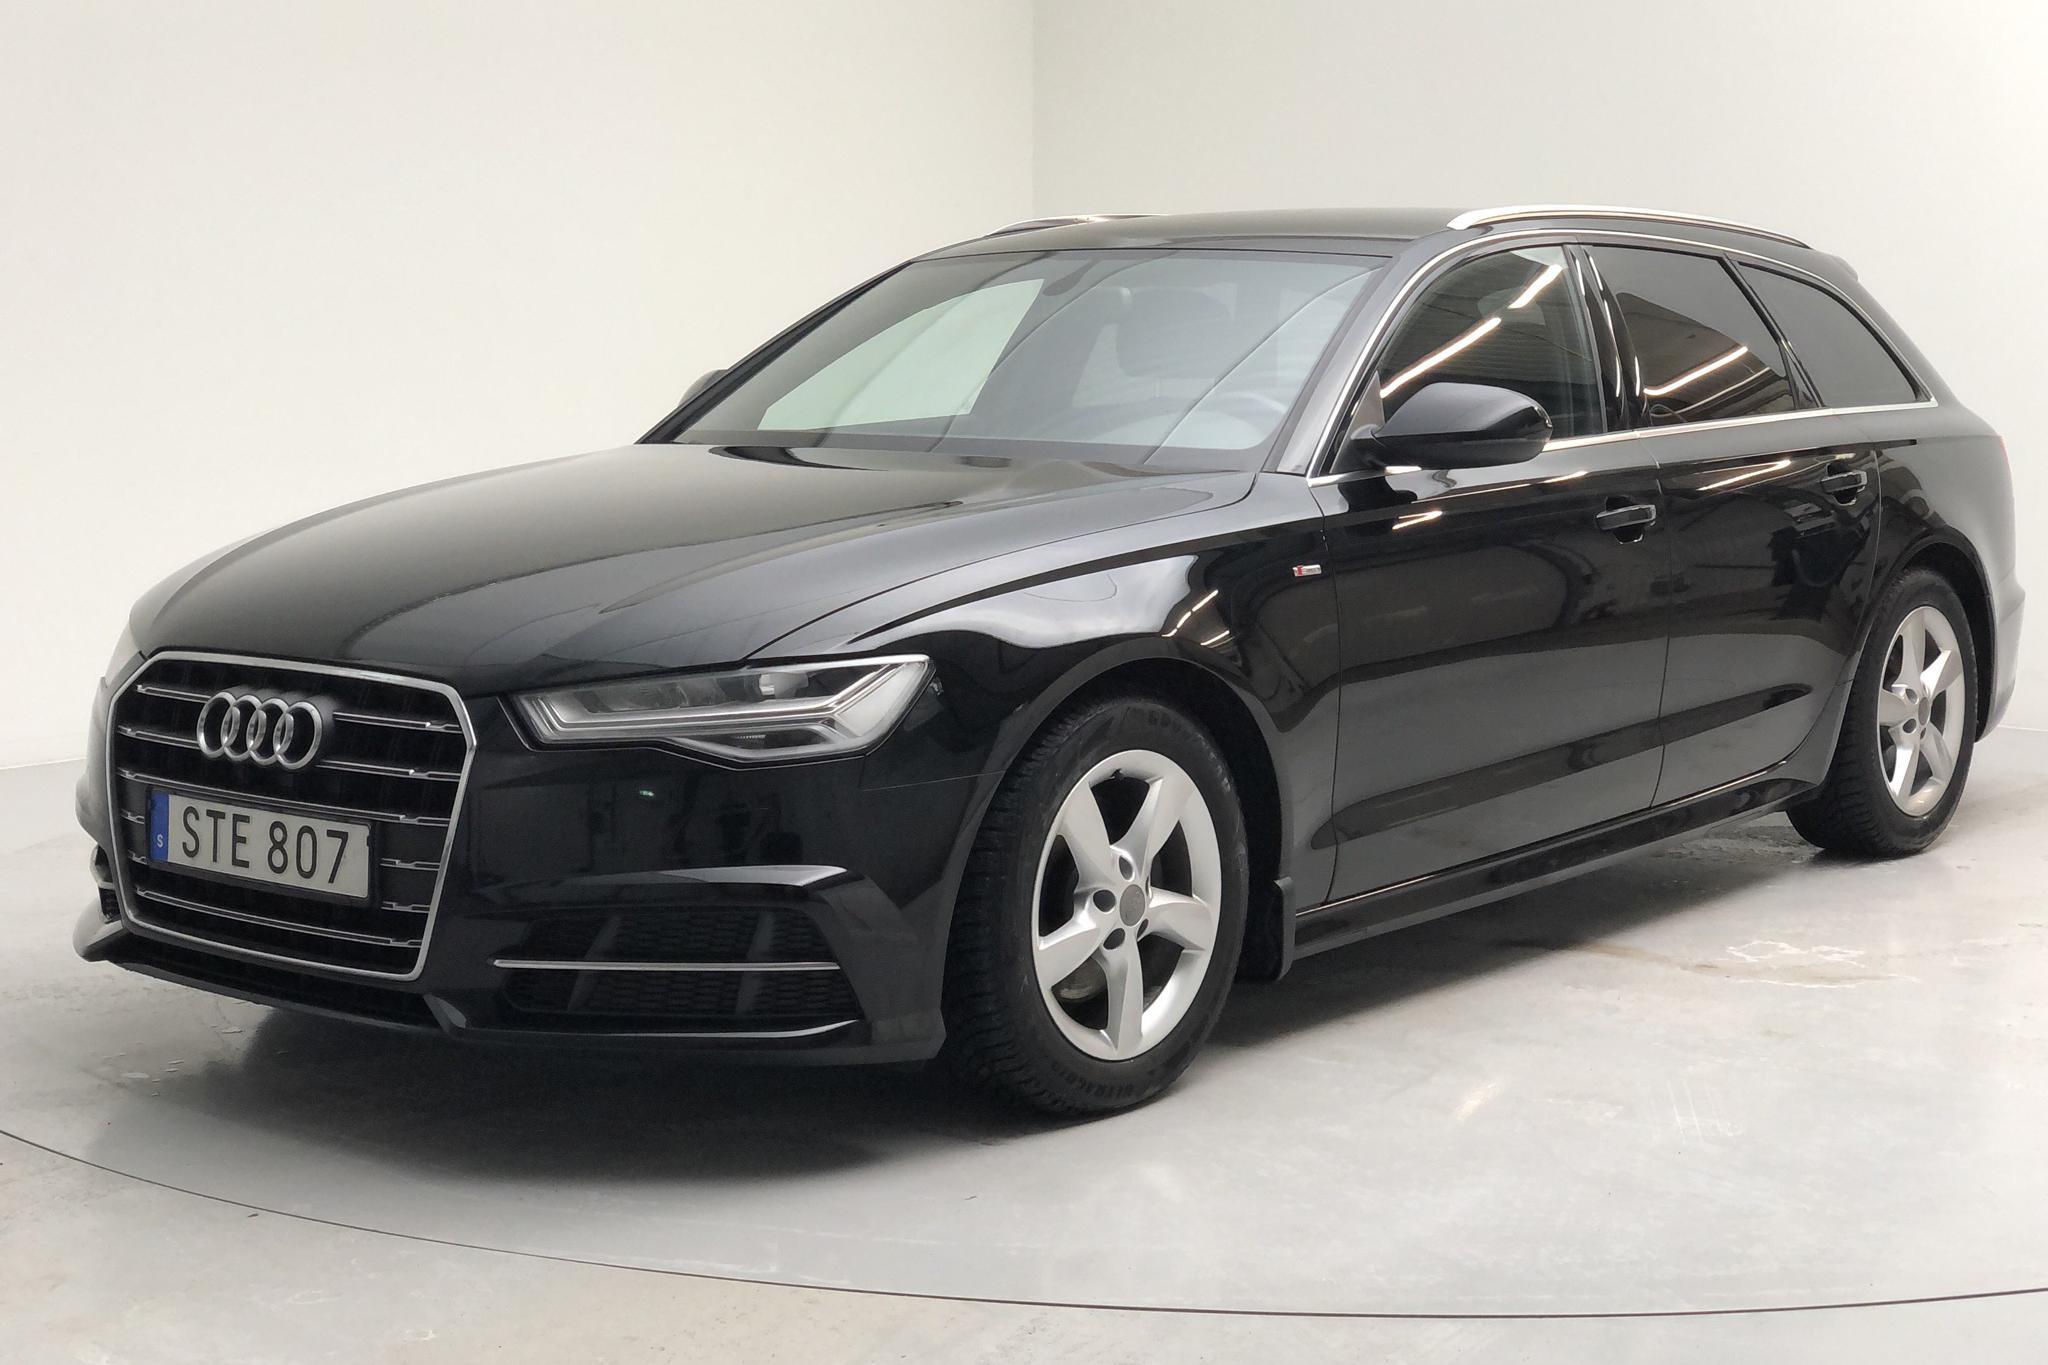 Audi A6 2.0 TDI Avant (190hk) - 63 280 km - Automatic - black - 2018